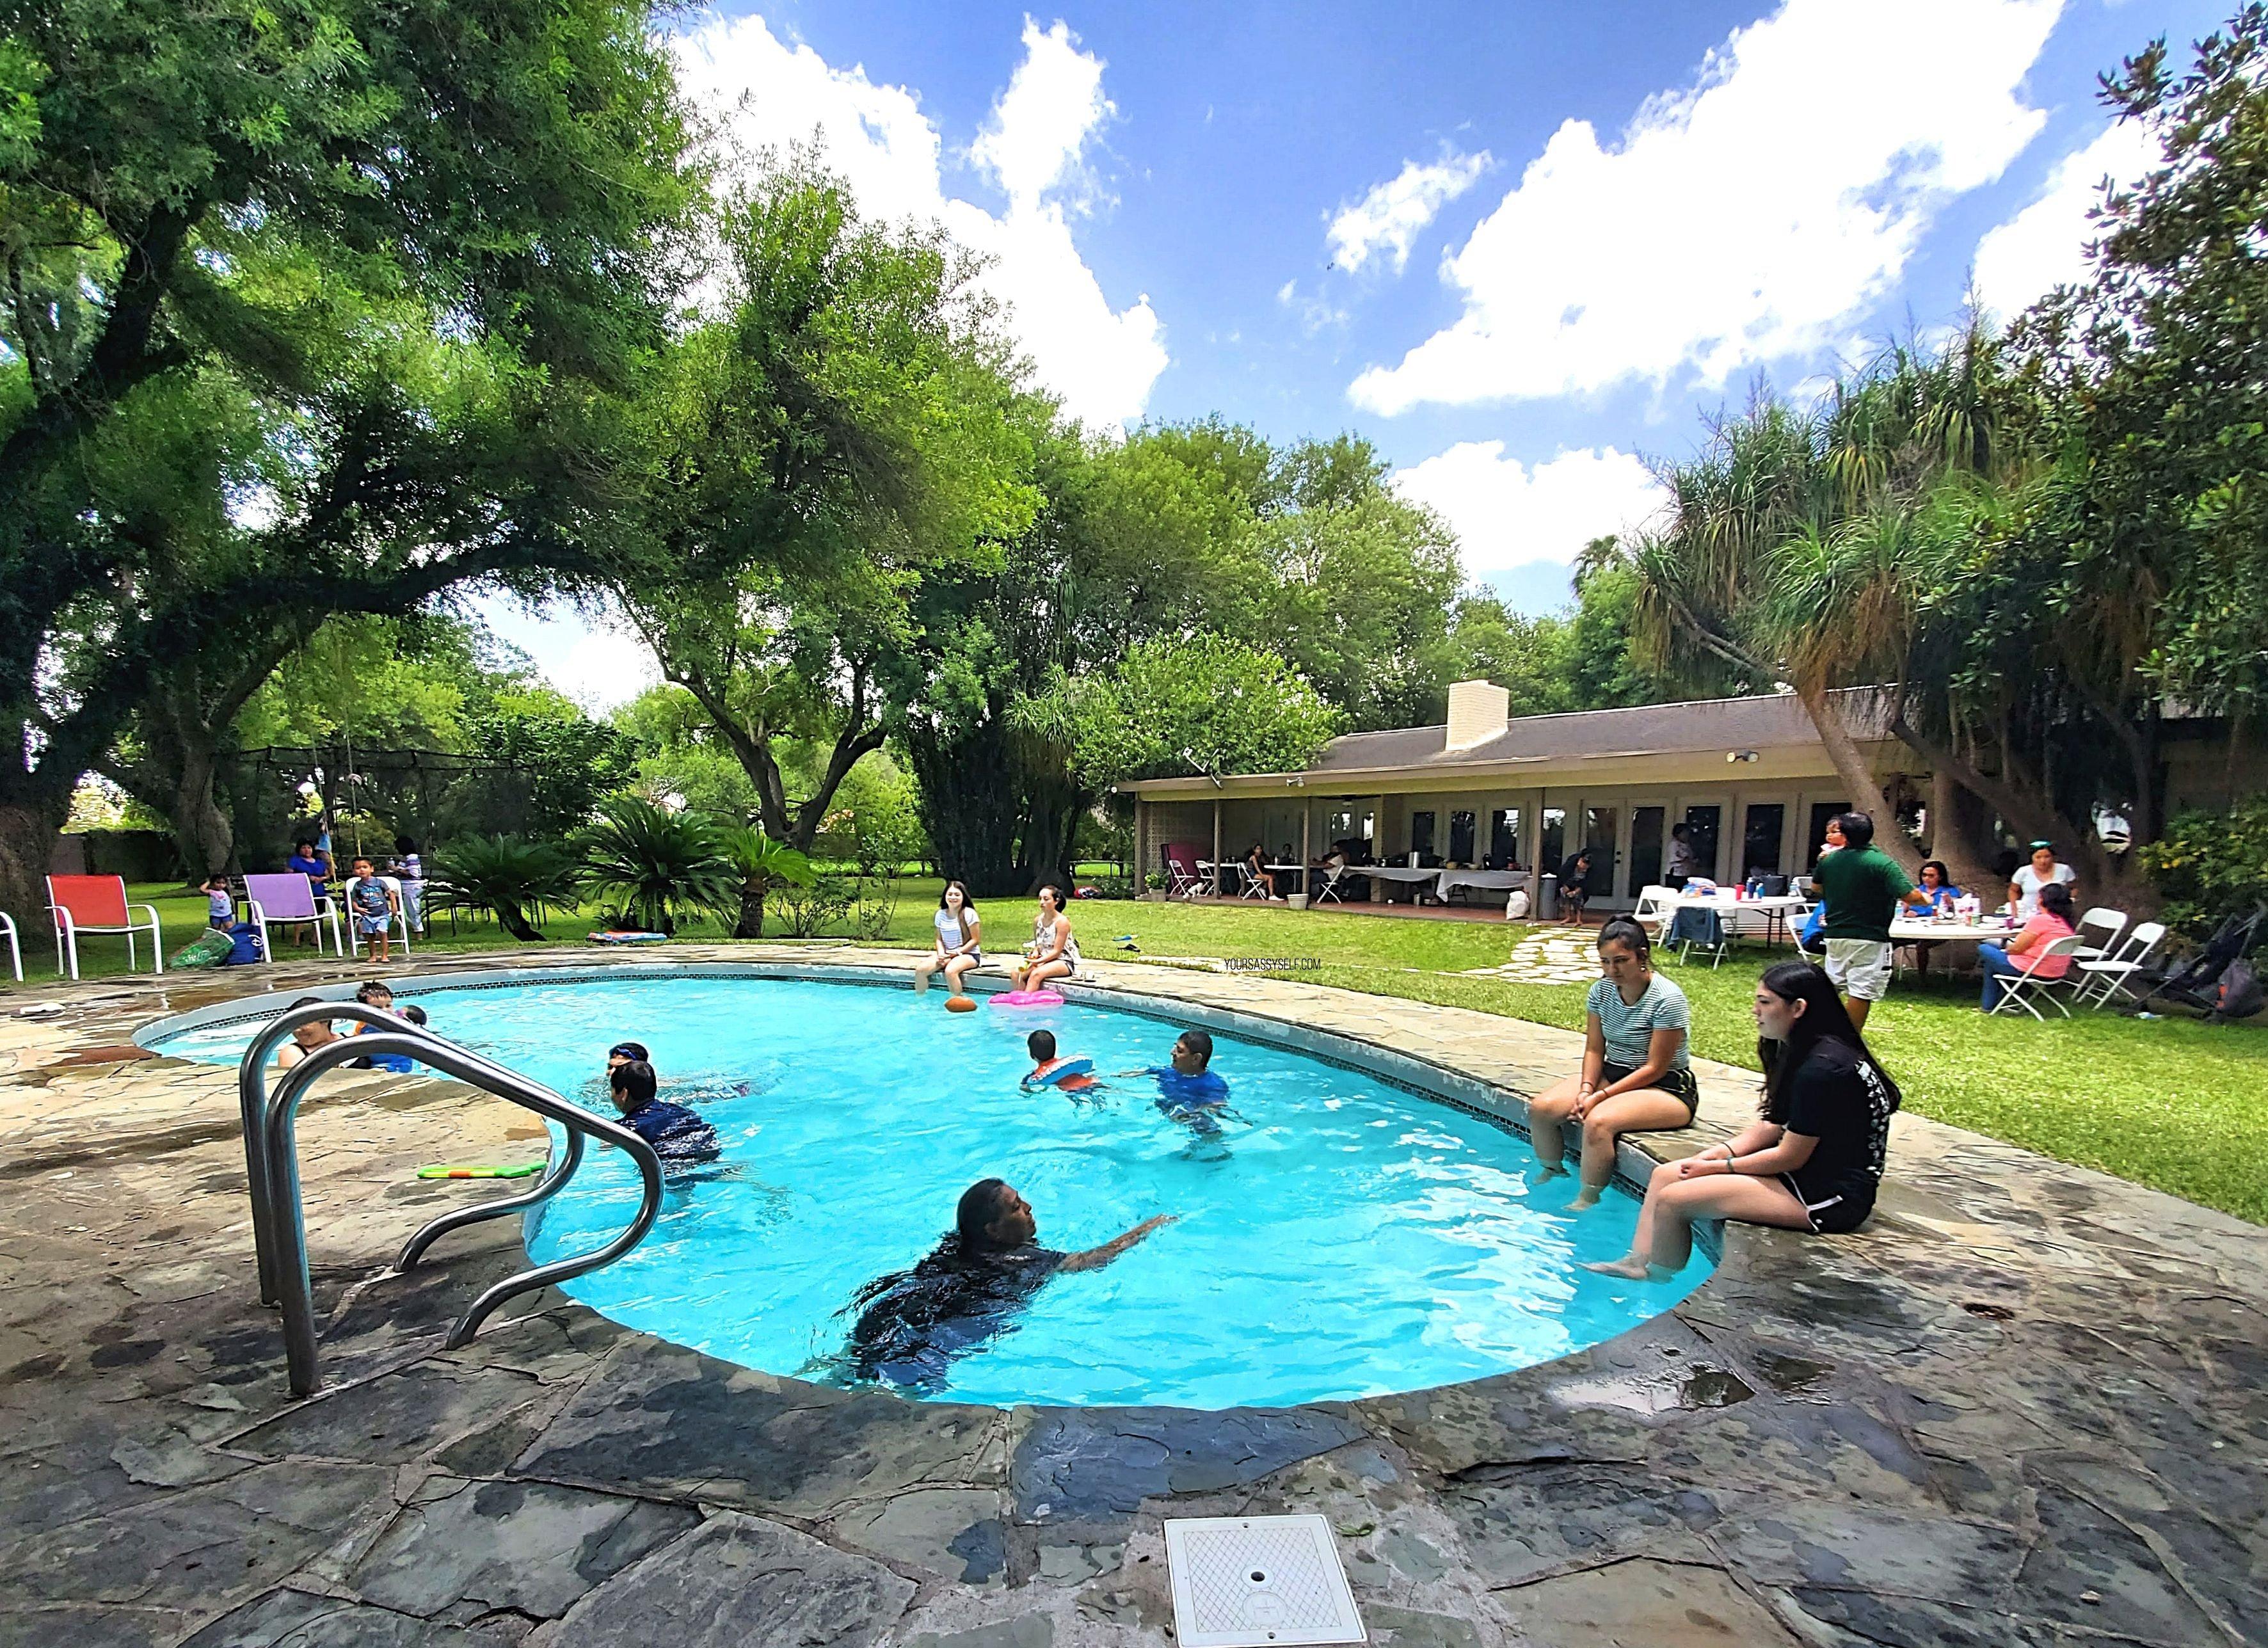 Poolside Family Fun - yoursassyself.com